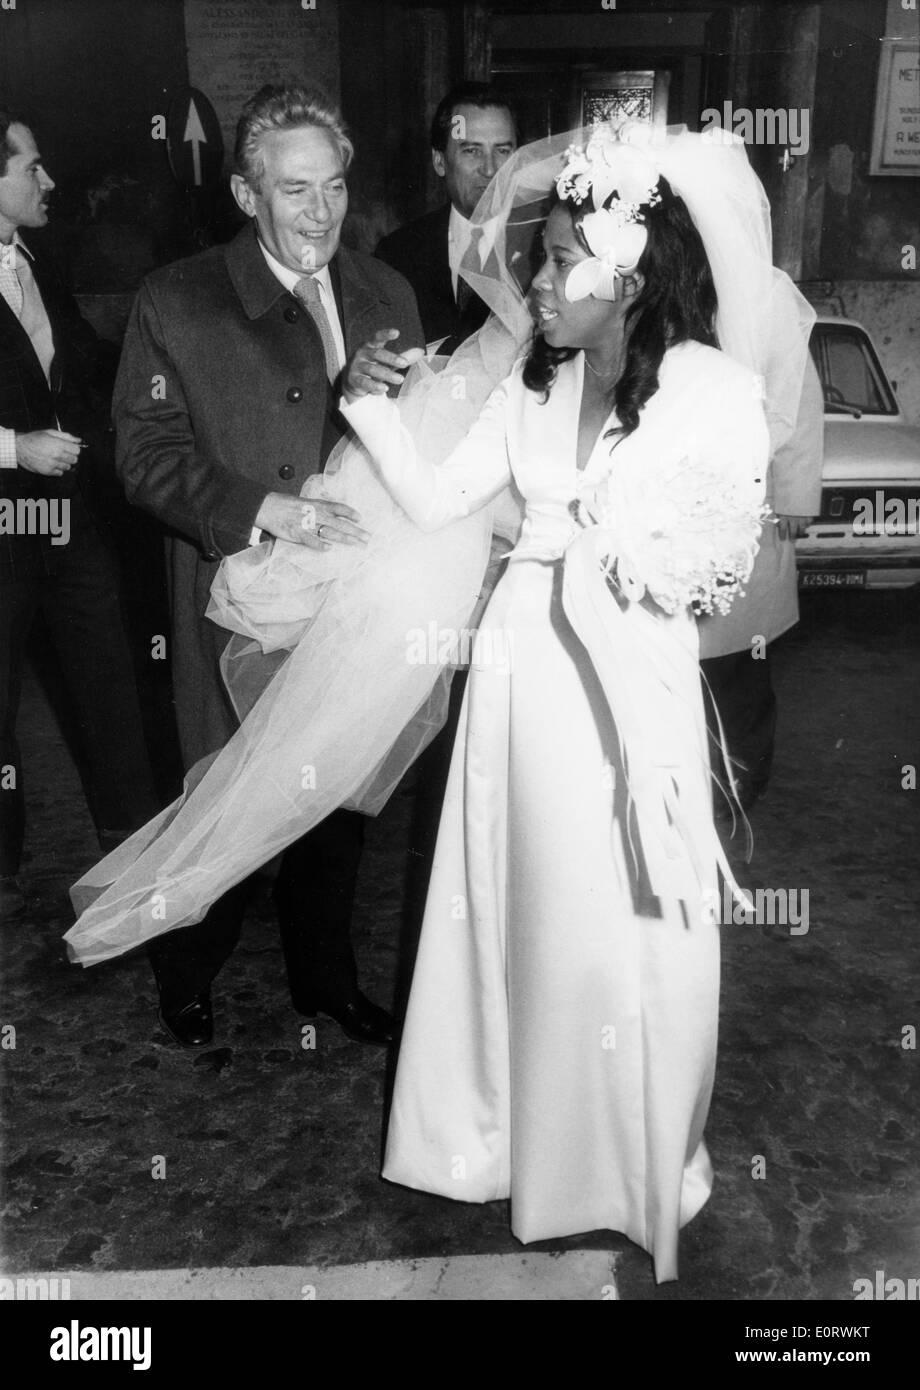 Actor Peter Finch marries Eletha Barrett - Stock Image